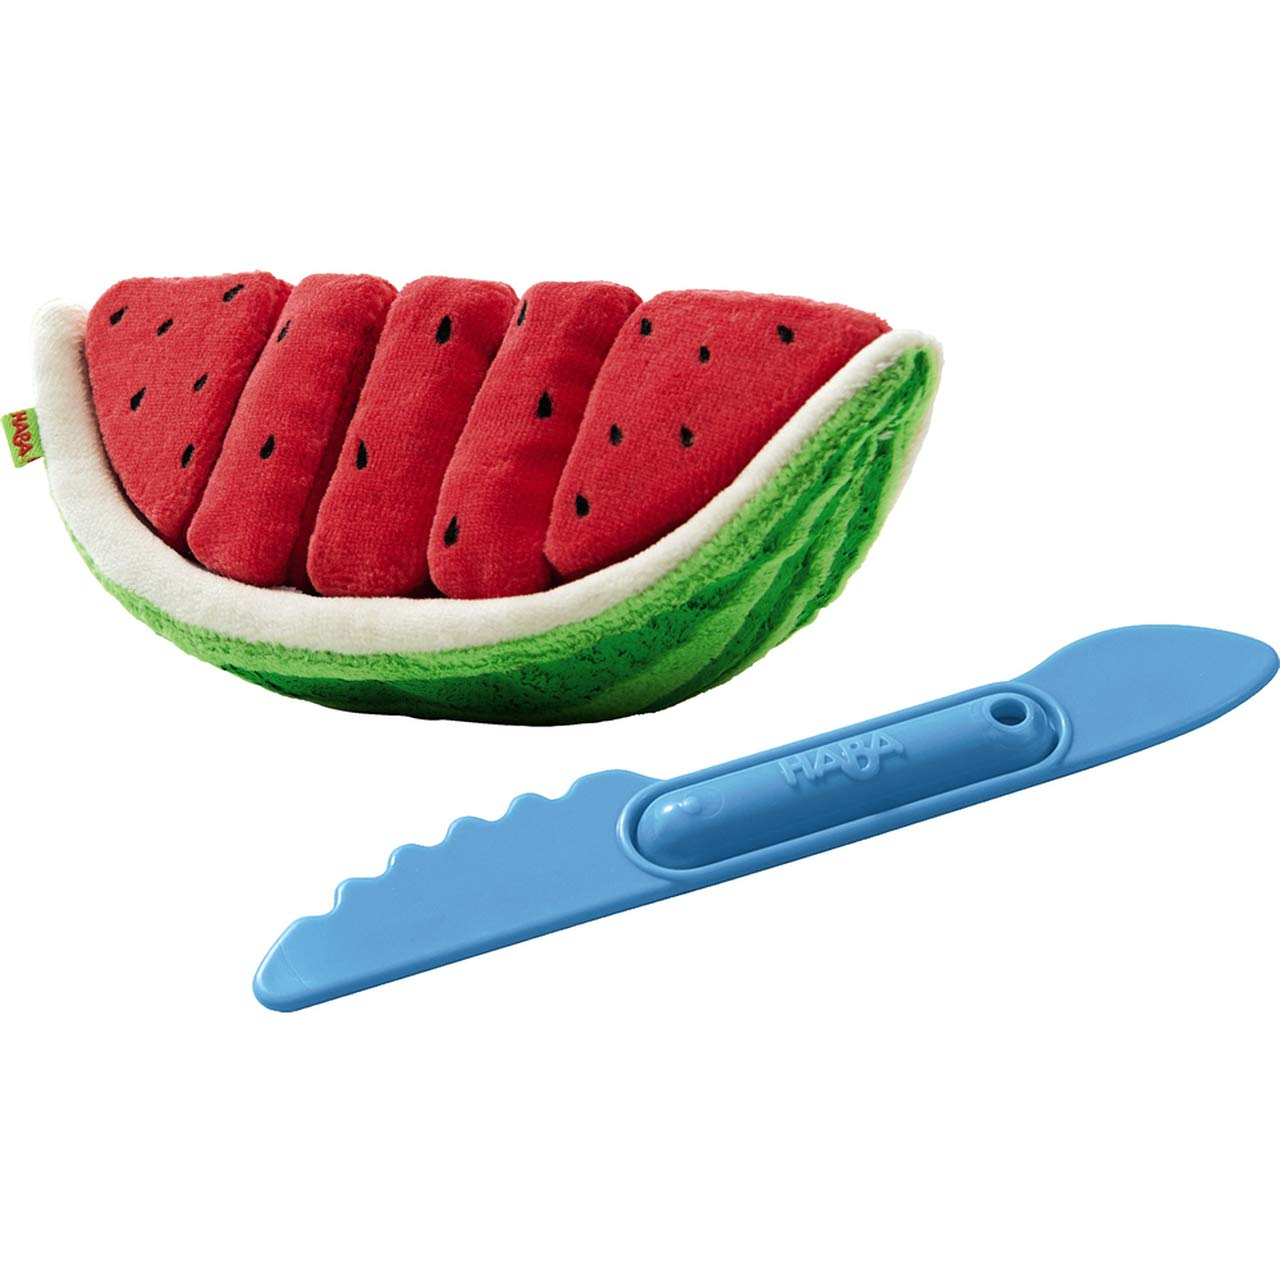 HABA Biofino Watermelon Washable Plush Play Food with 5 Velcro Slices by HABA